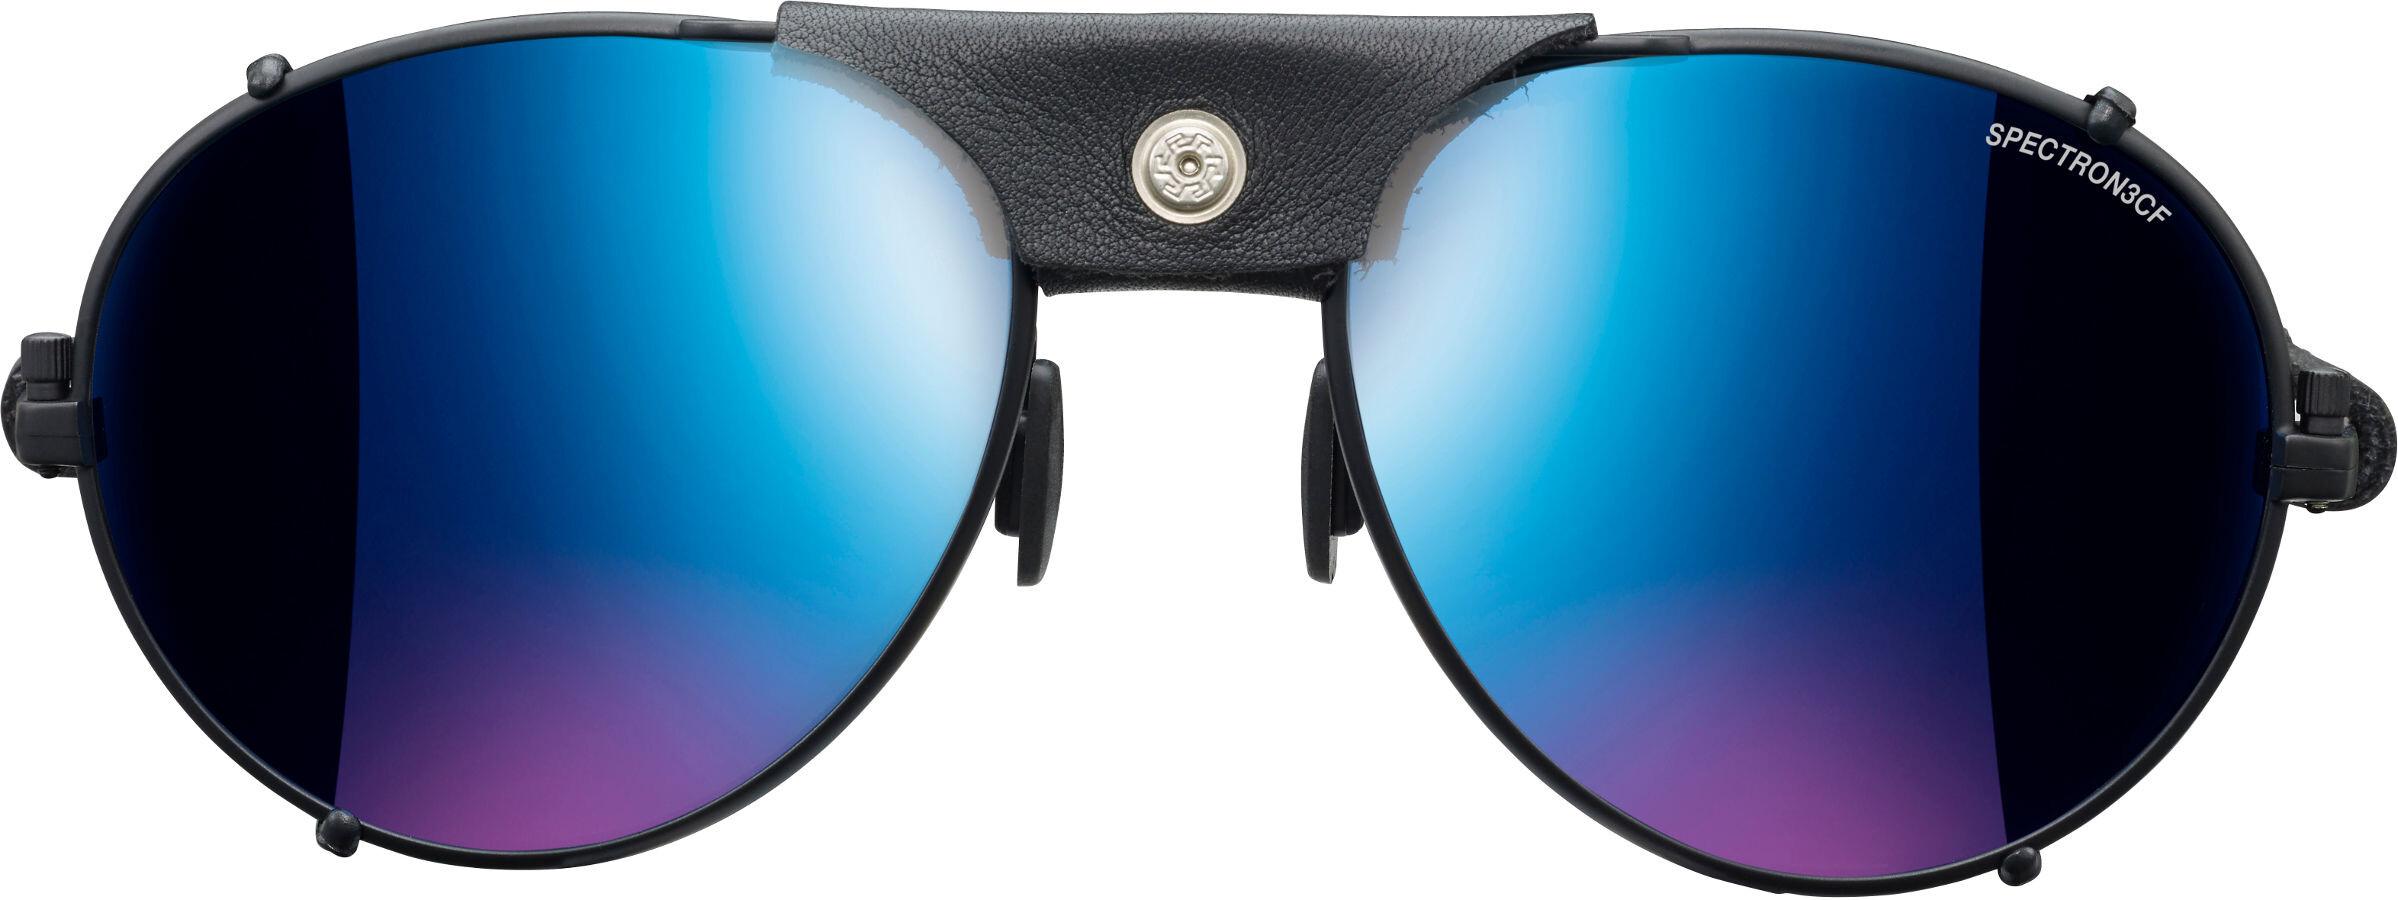 1a0203f58b Julbo Cham Spectron 3CF Glasses blue black at Addnature.co.uk